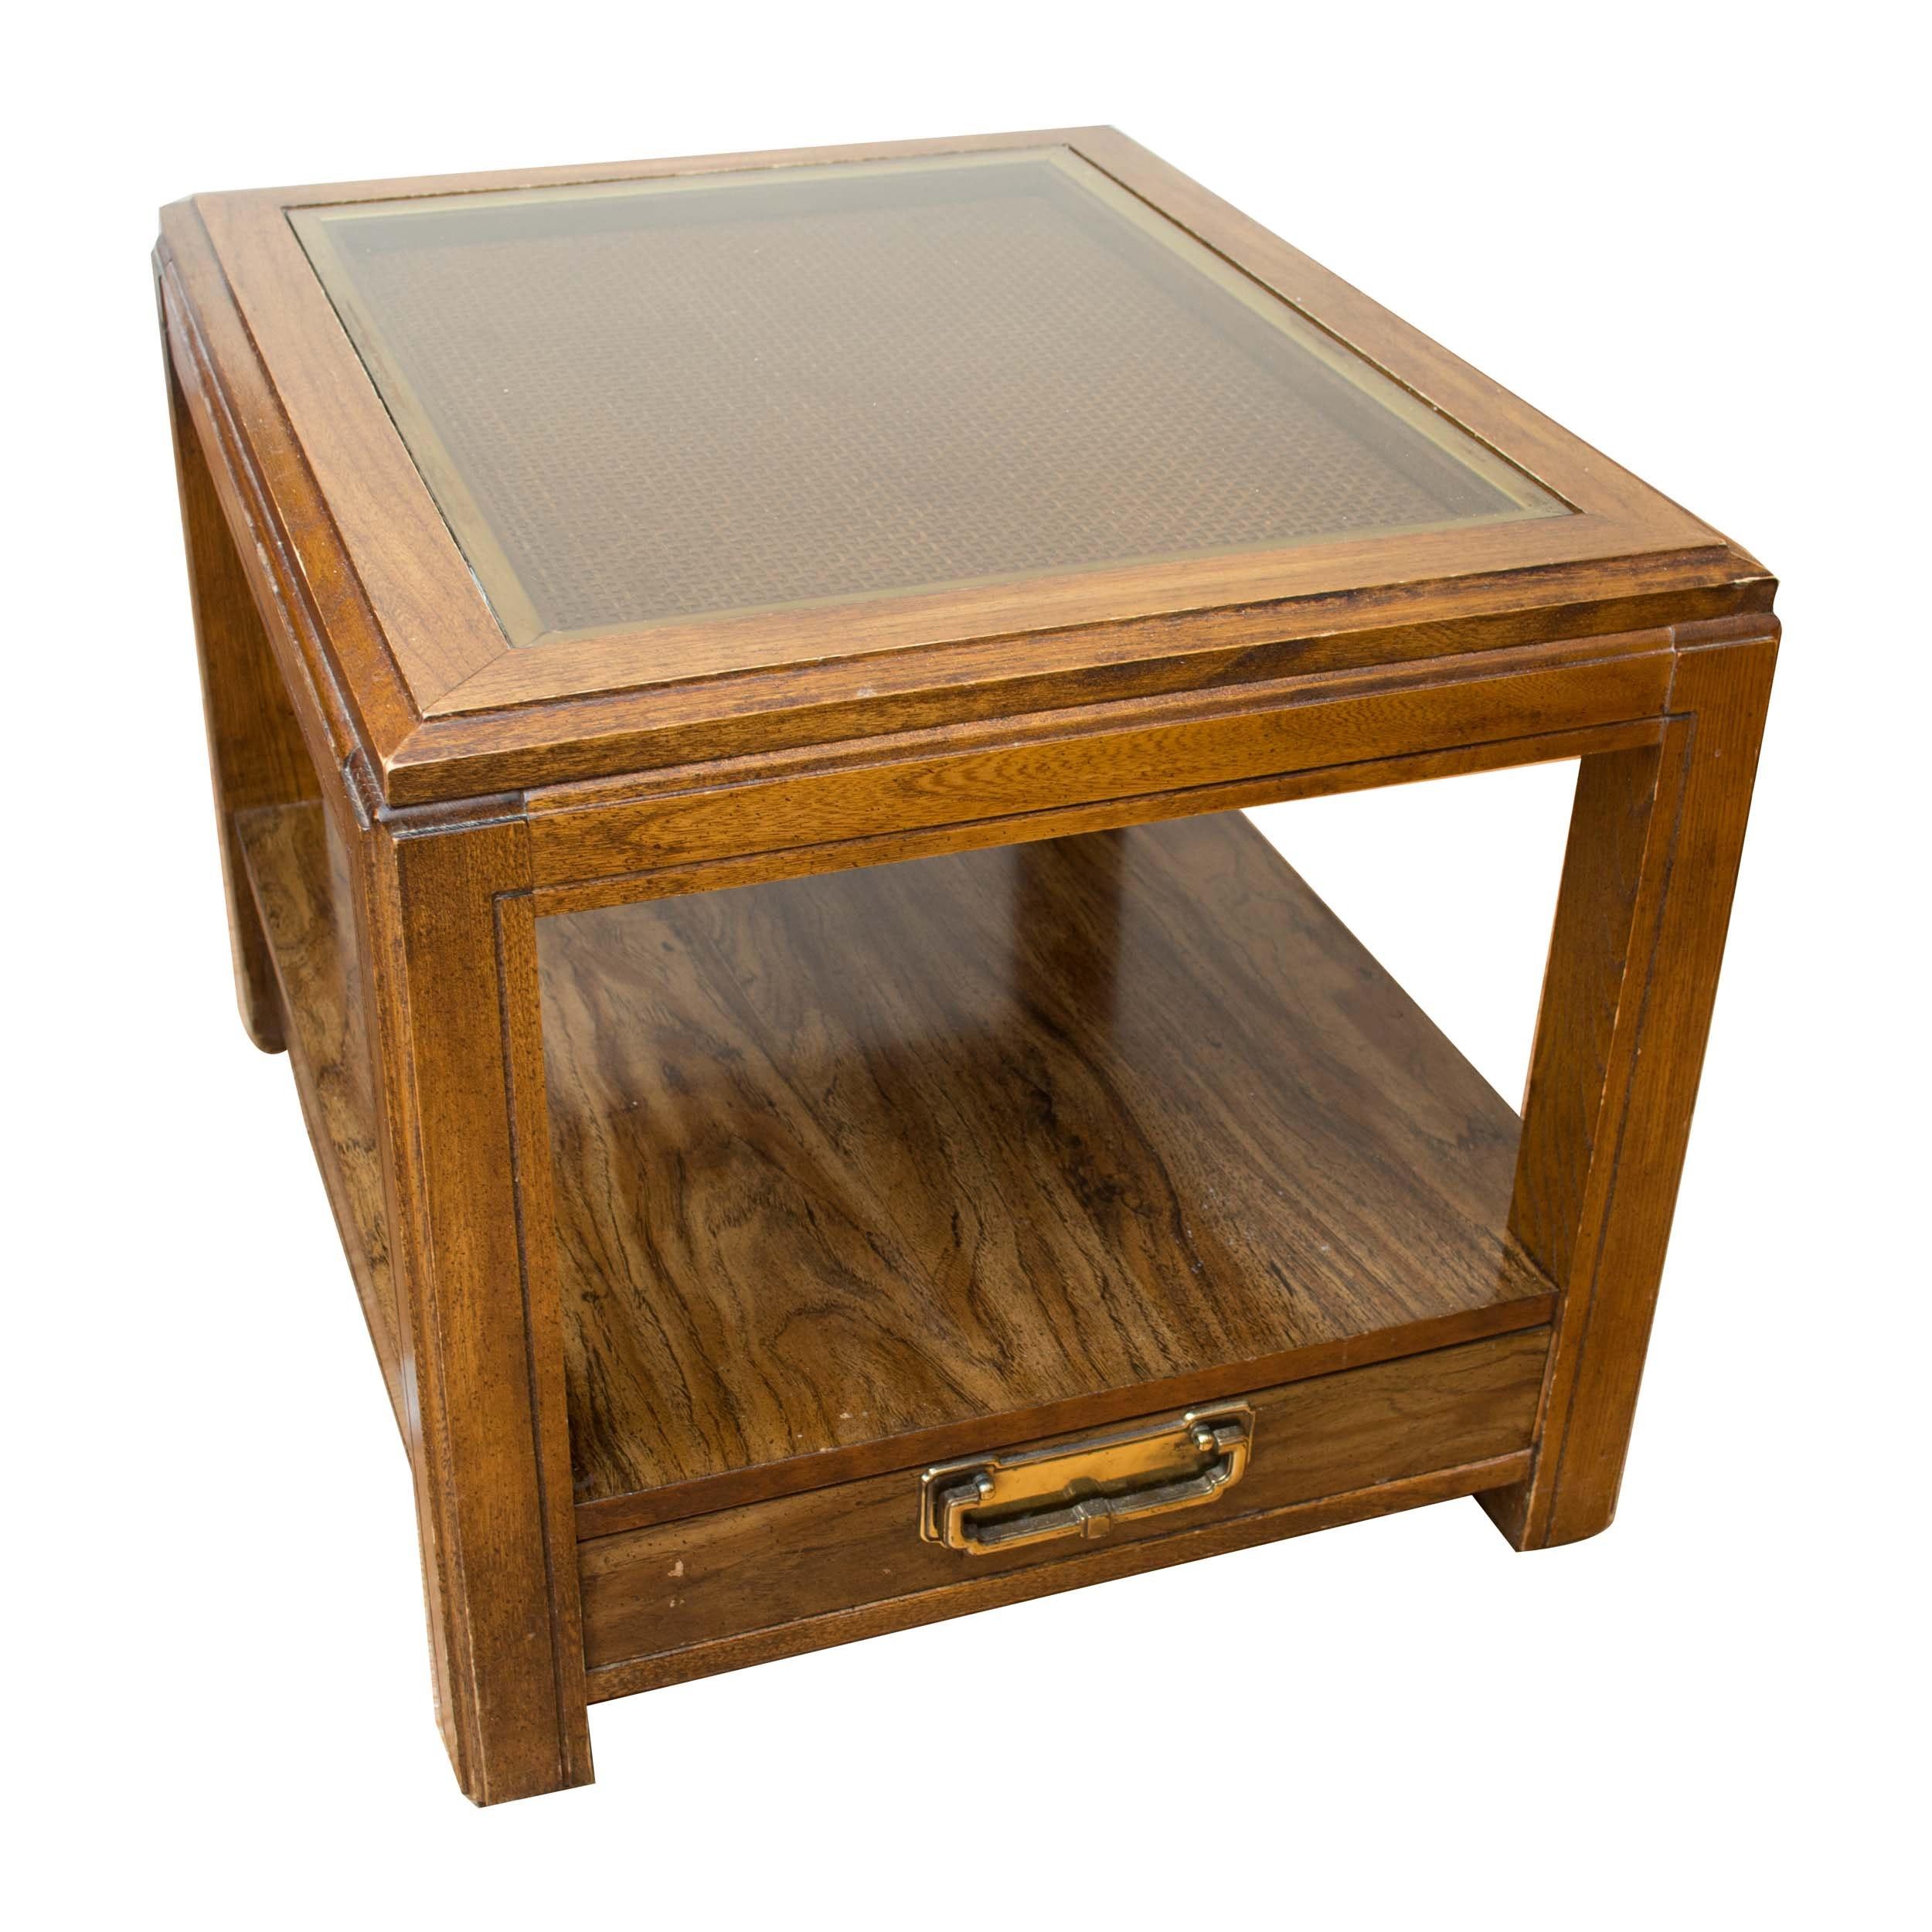 Oak and Glass Side Table by Bassett